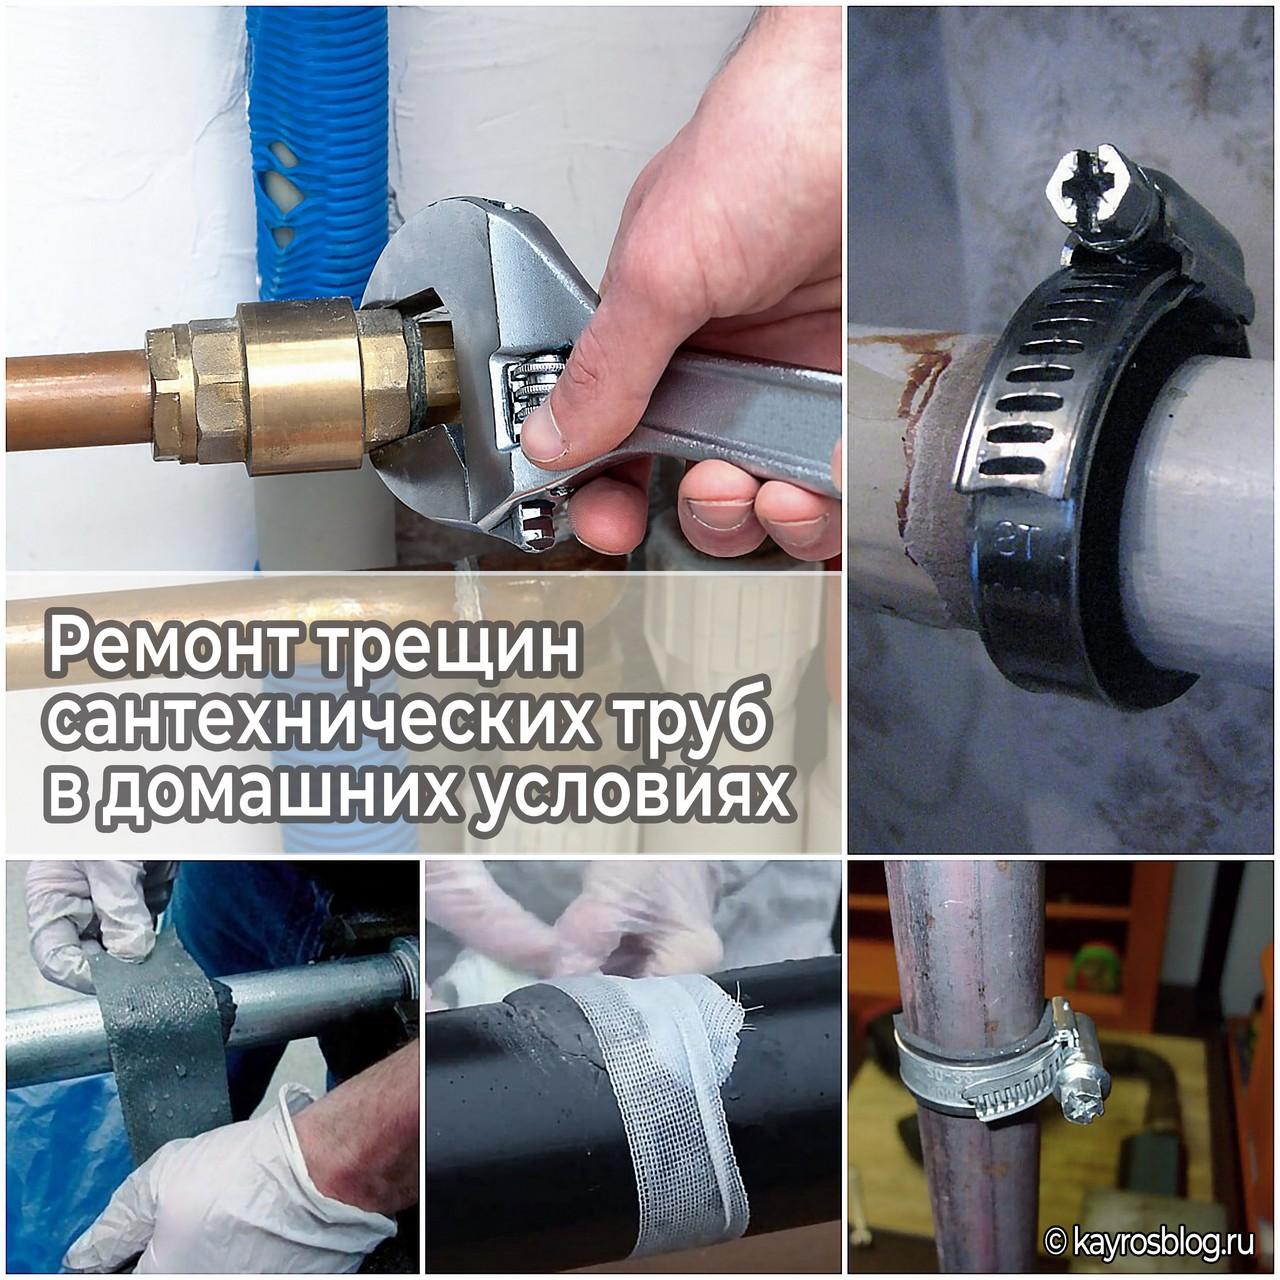 Ремонт трещин сантехнических труб в домашних условиях